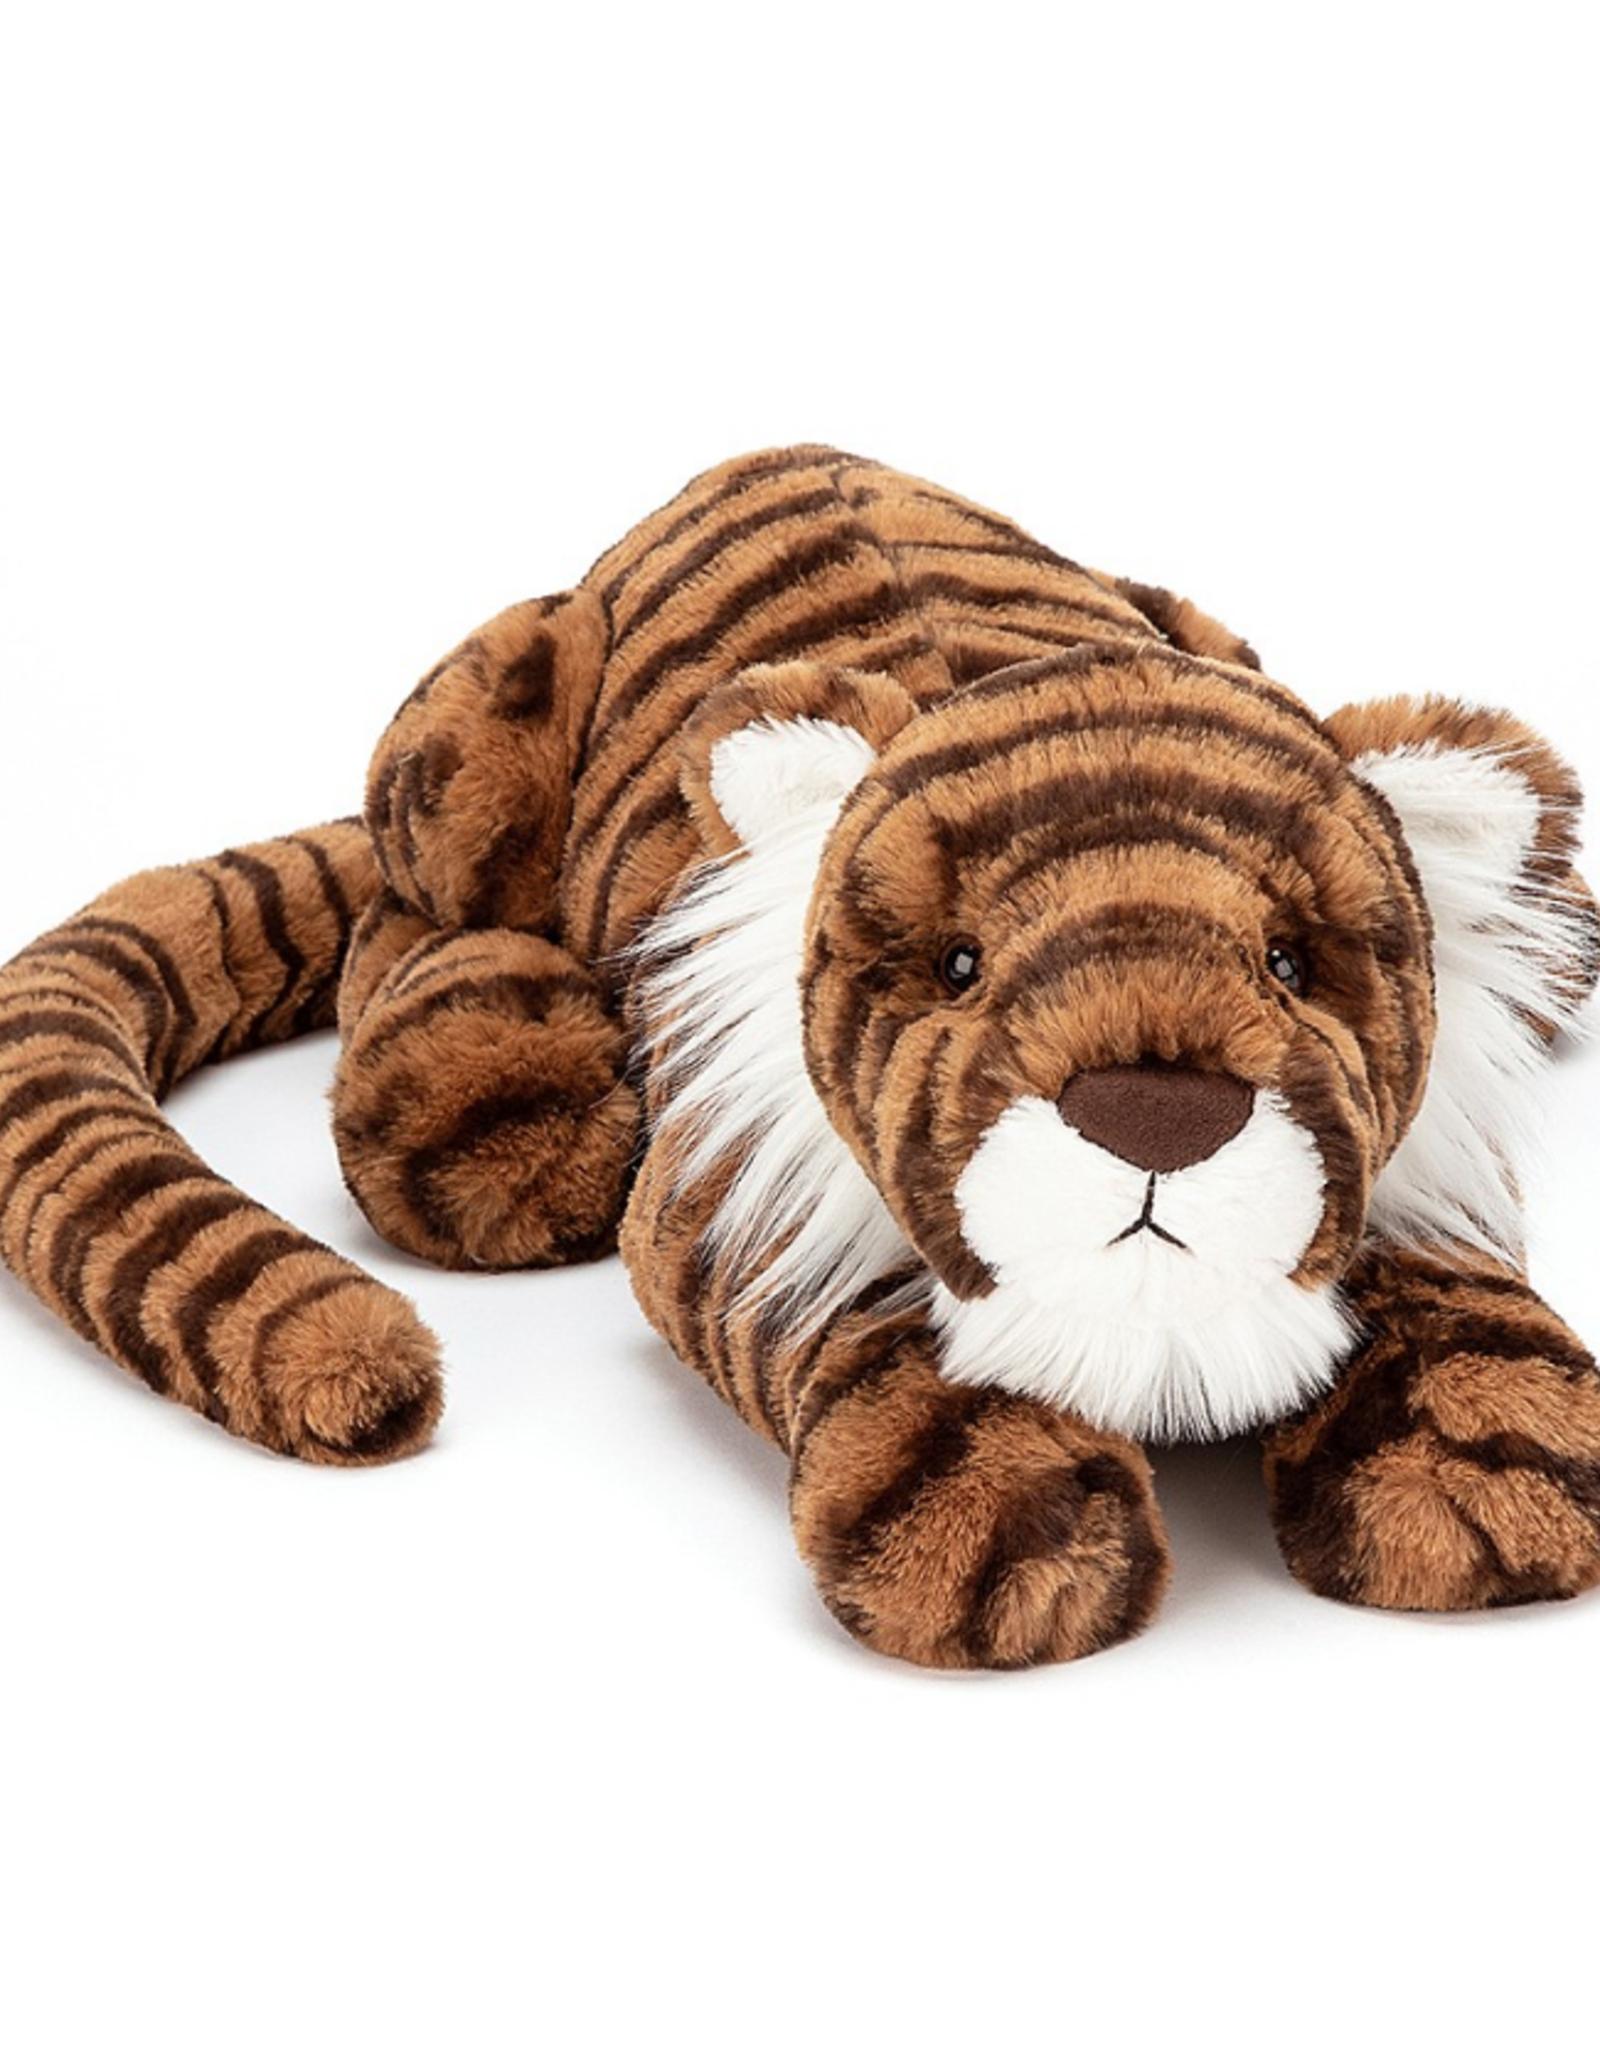 JellyCat - Tia Tiger Little